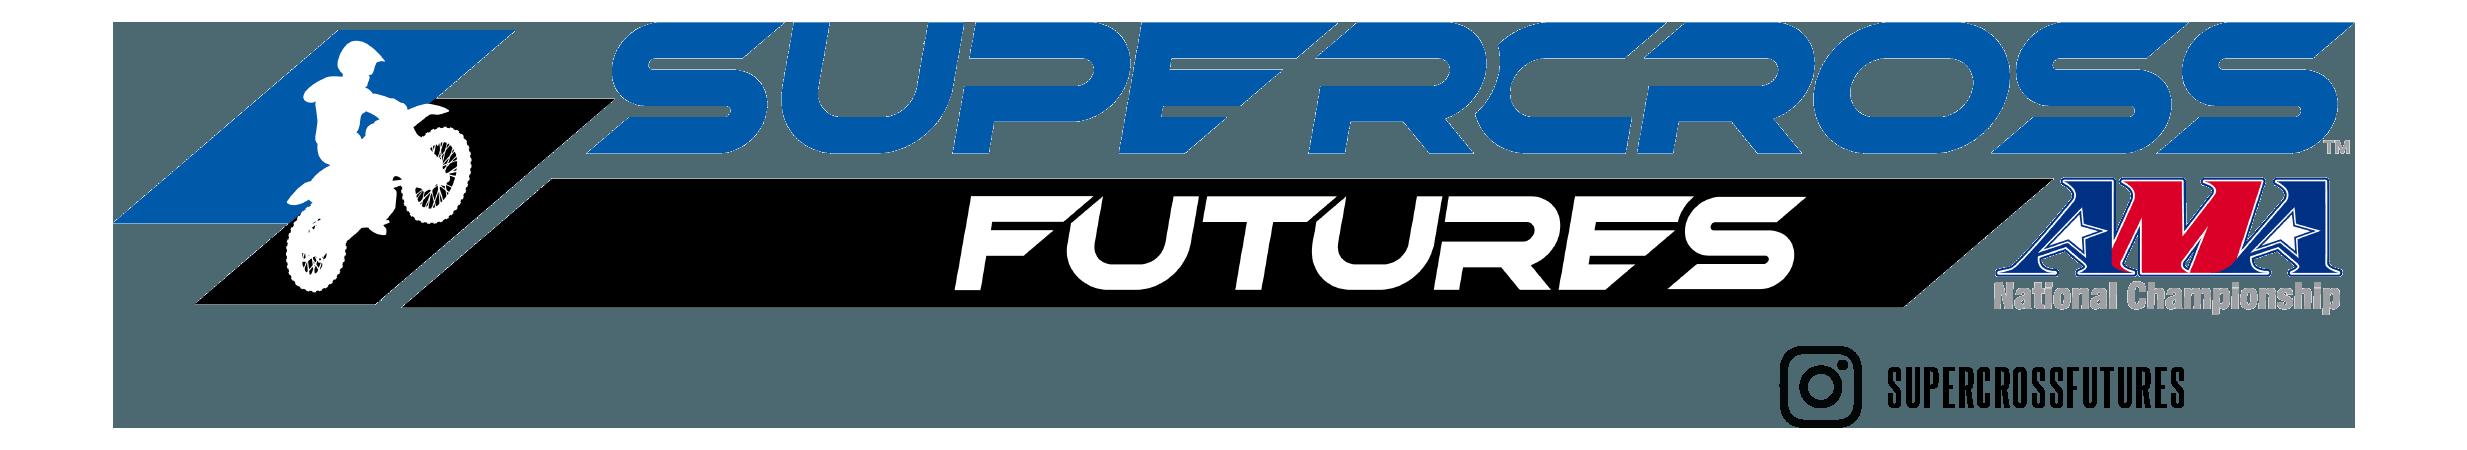 Supercross Futures - Follow the Future!